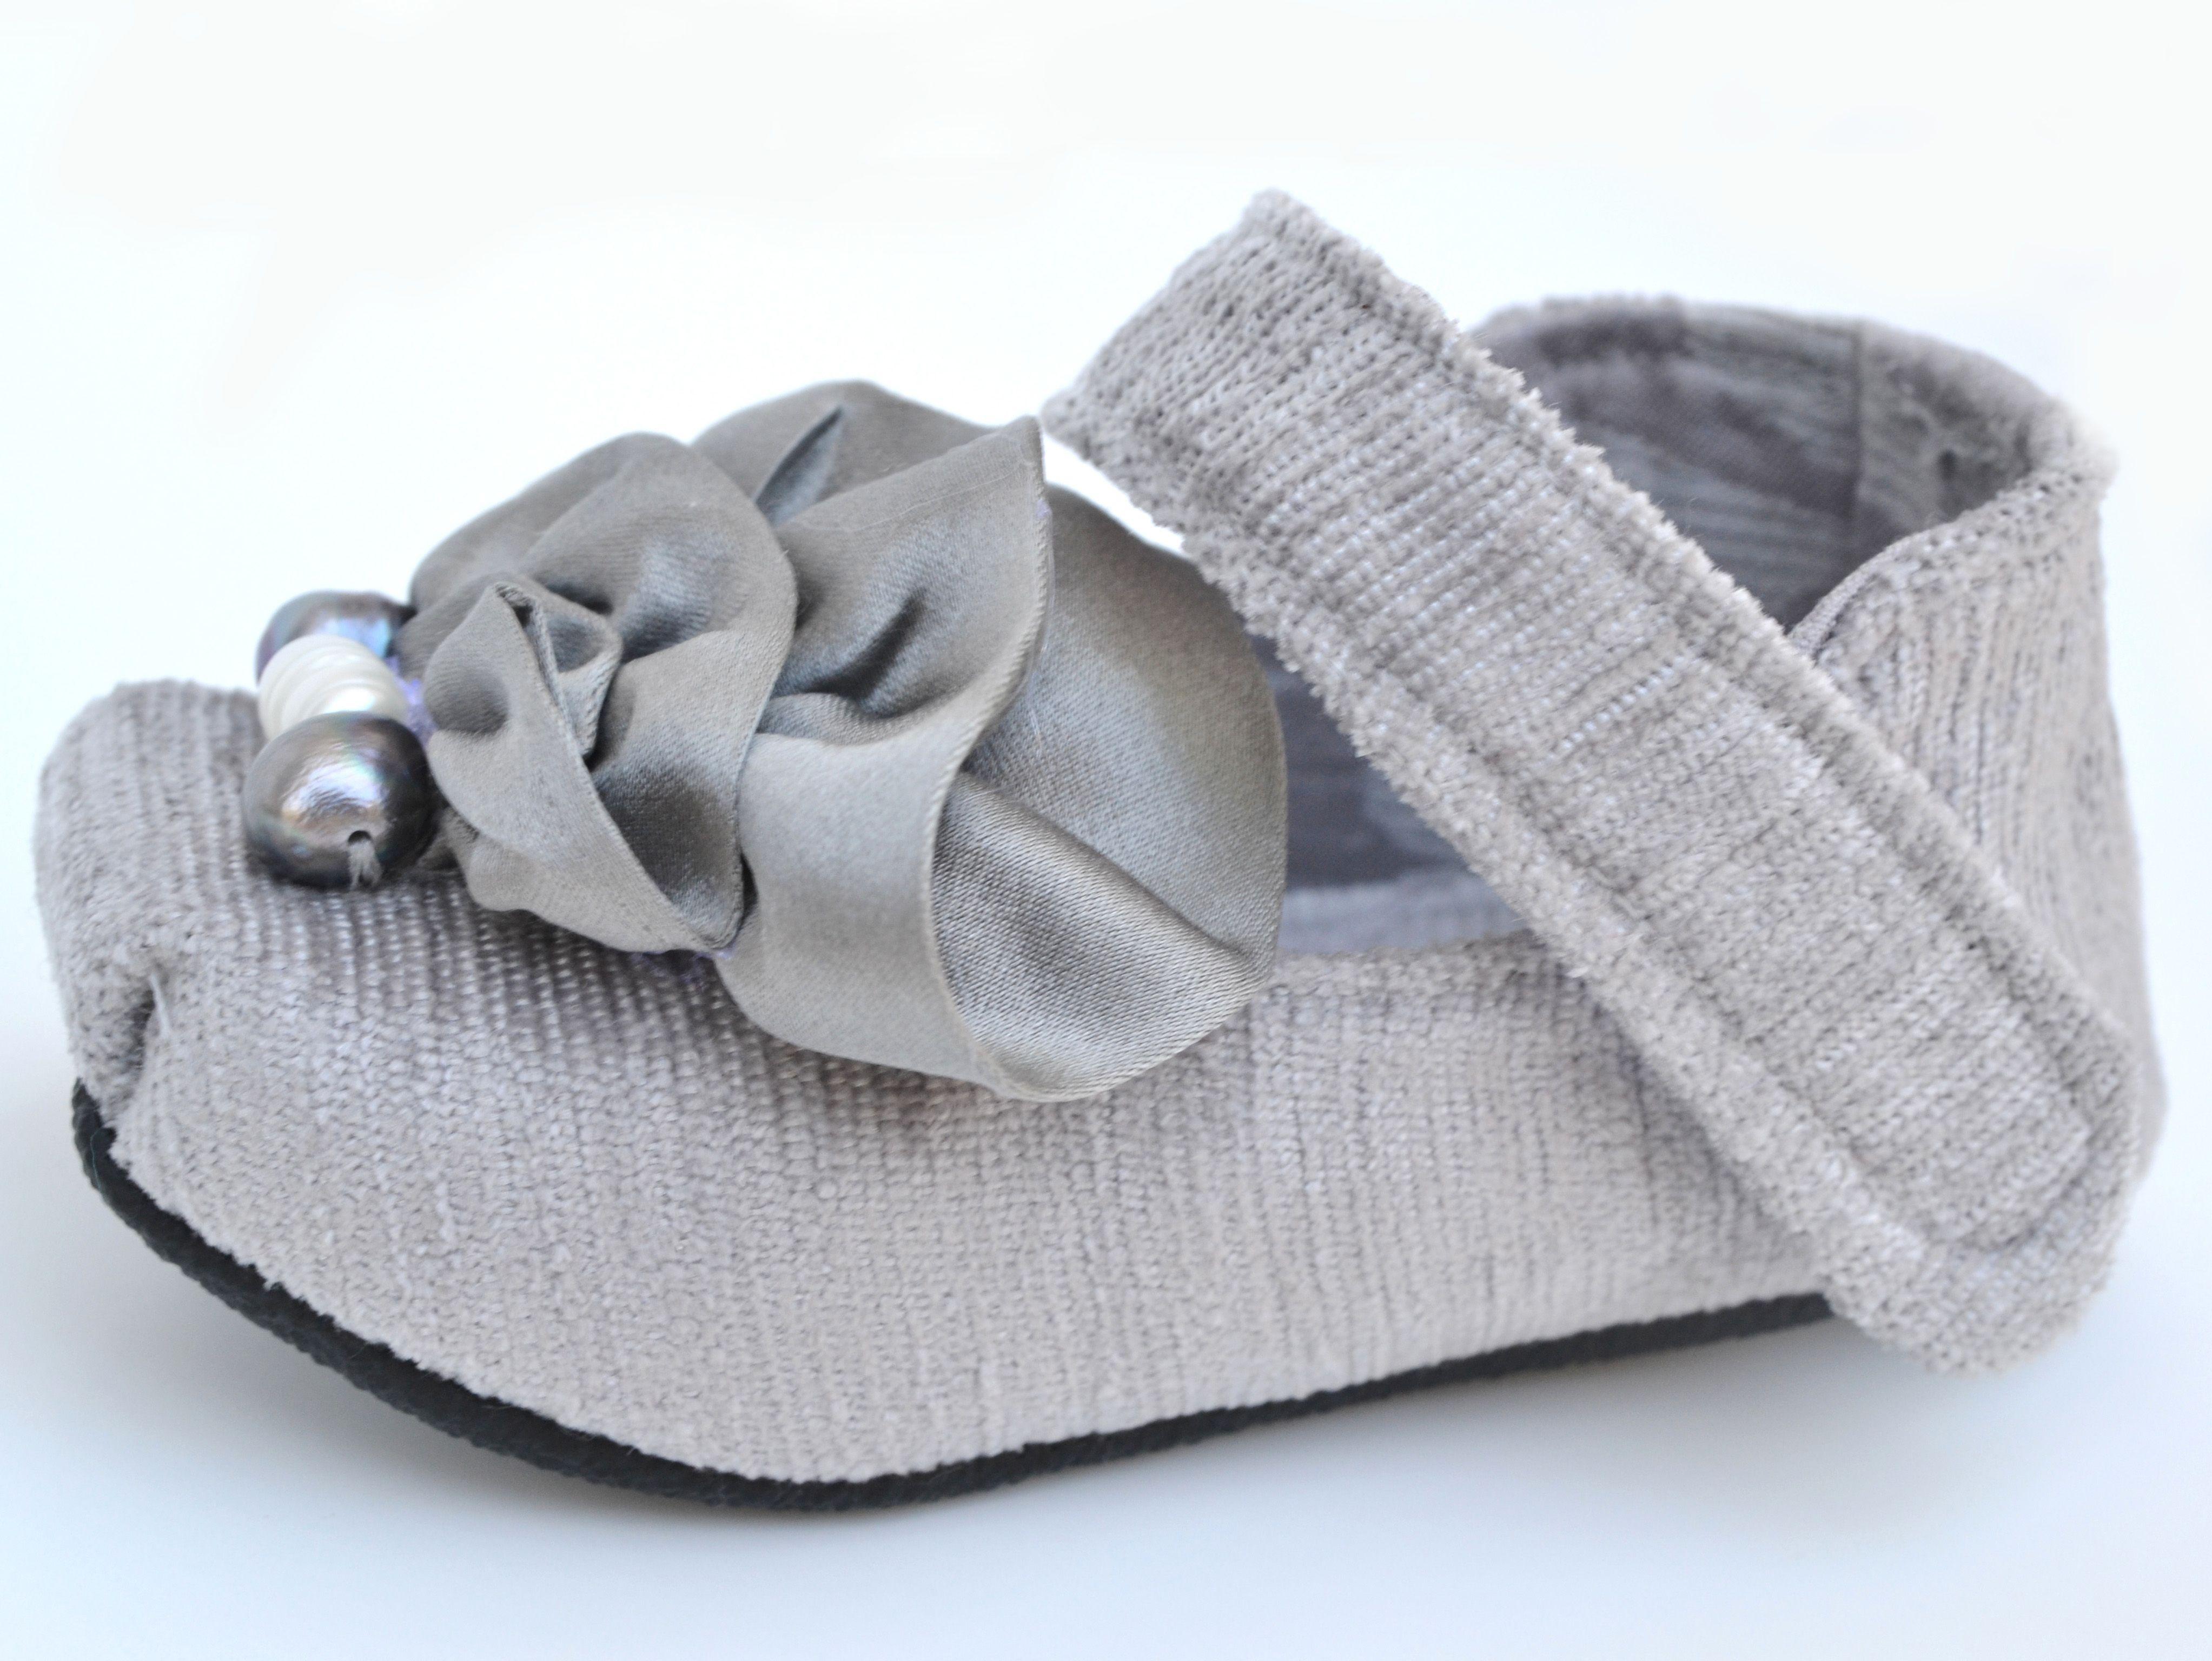 LaValya Handmade Baby Shoes just precious newborn shoes